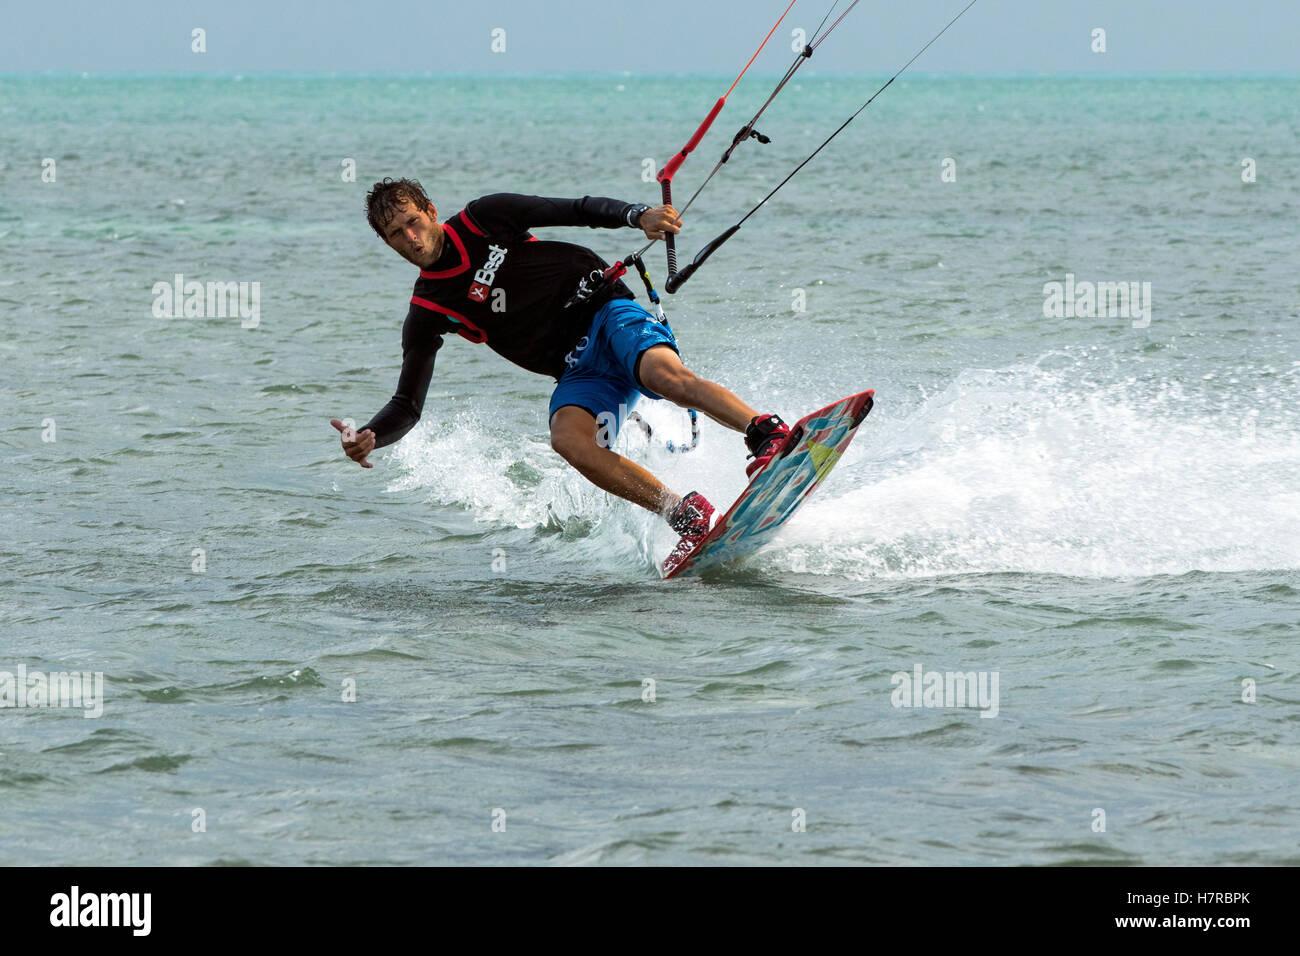 Professional Kitesurfer Ben Jopling at Veterans Memorial Park - Little Duck Key, Florida, USA - Stock Image